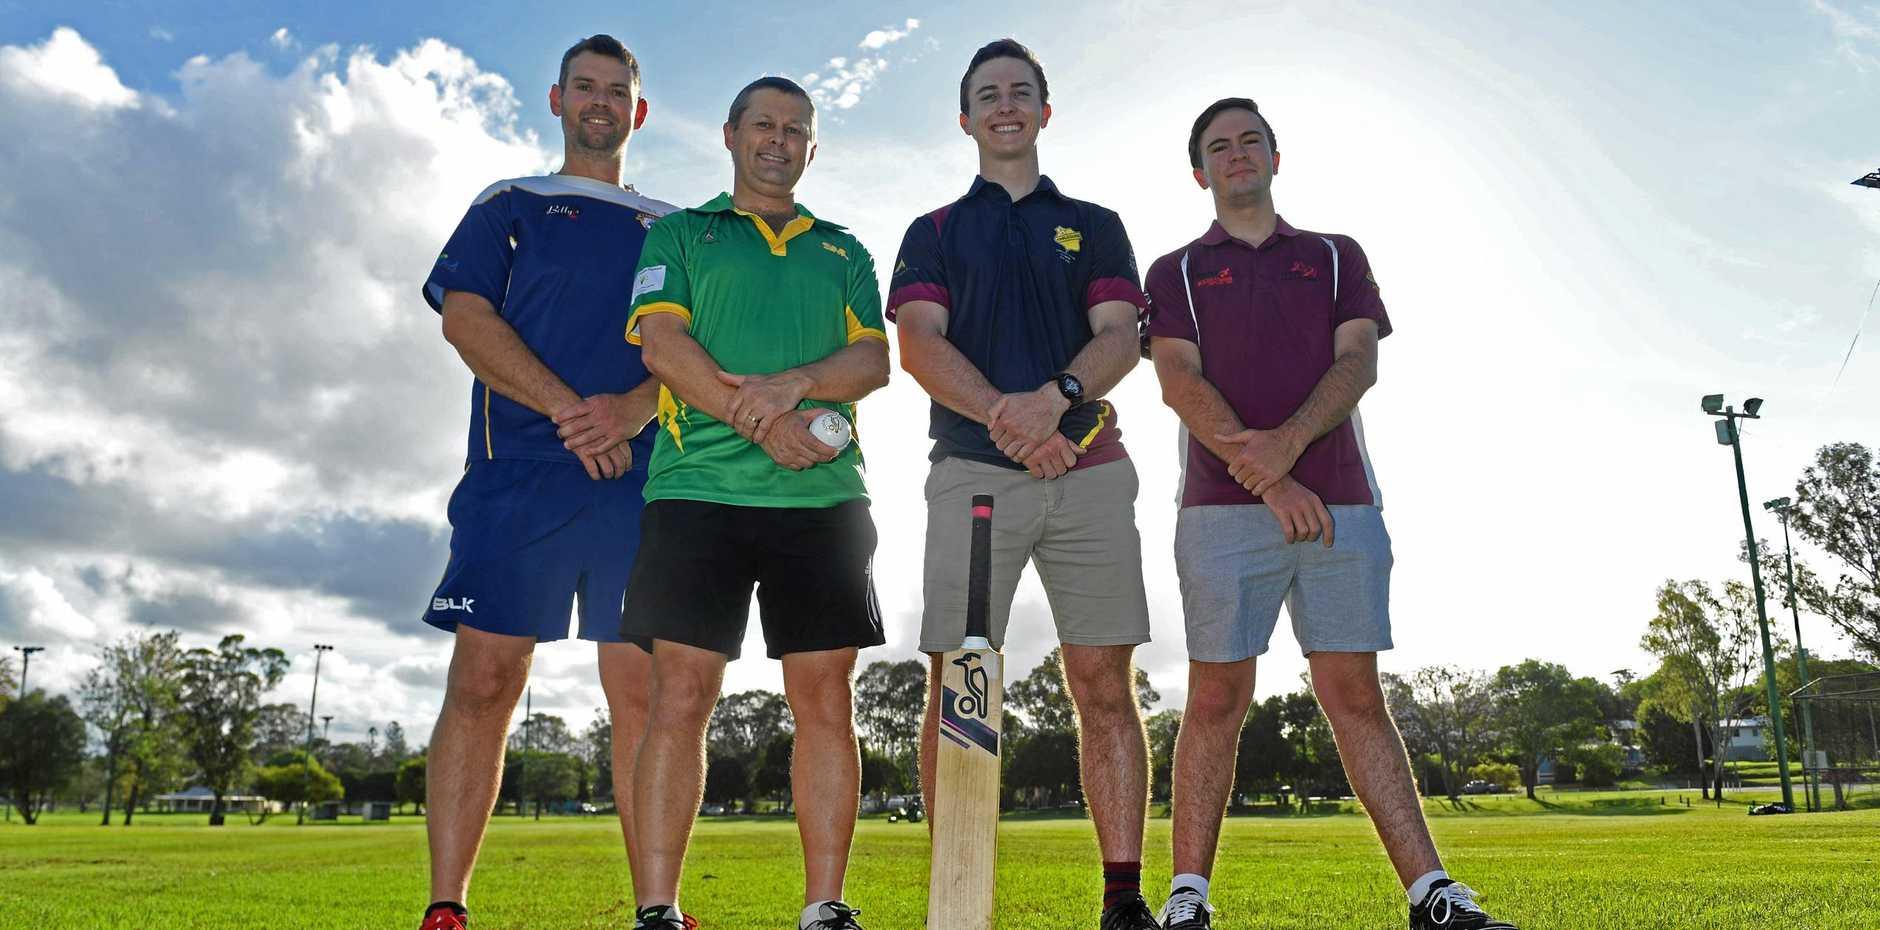 NEW SEASON: Valleys' captain Brad Brigg, Wests' captain Graeme Bembrick, Harlequins A-grade batsman Luke Lidbetter and Colts Reserve grade batsman Thomas Lee.